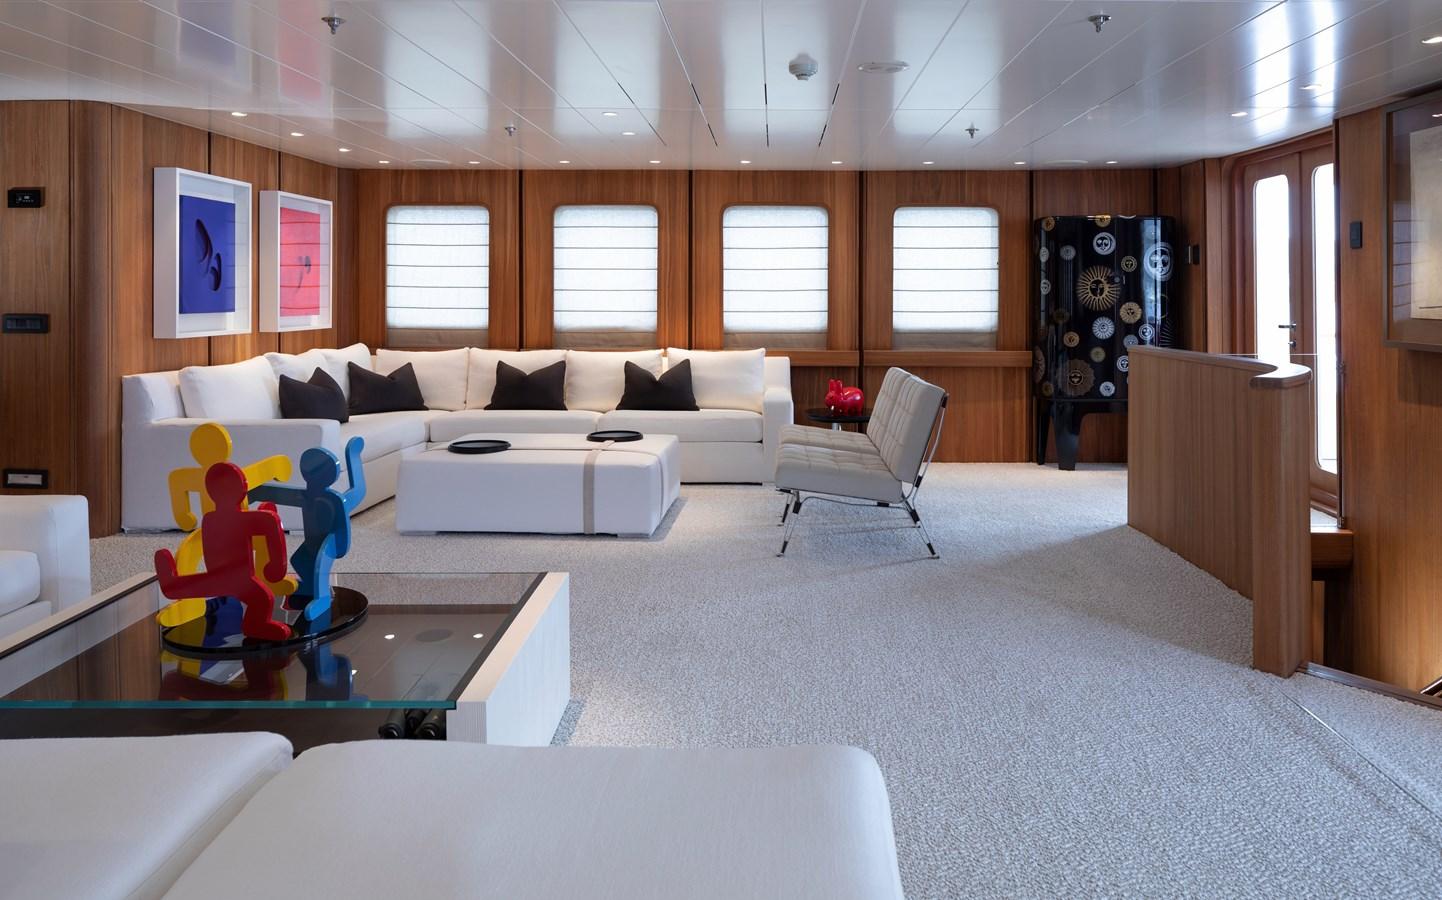 OLIVIA_00004897_vb1514645 1972 OY LAIVATEOLLISUUS  Mega Yacht 2726249